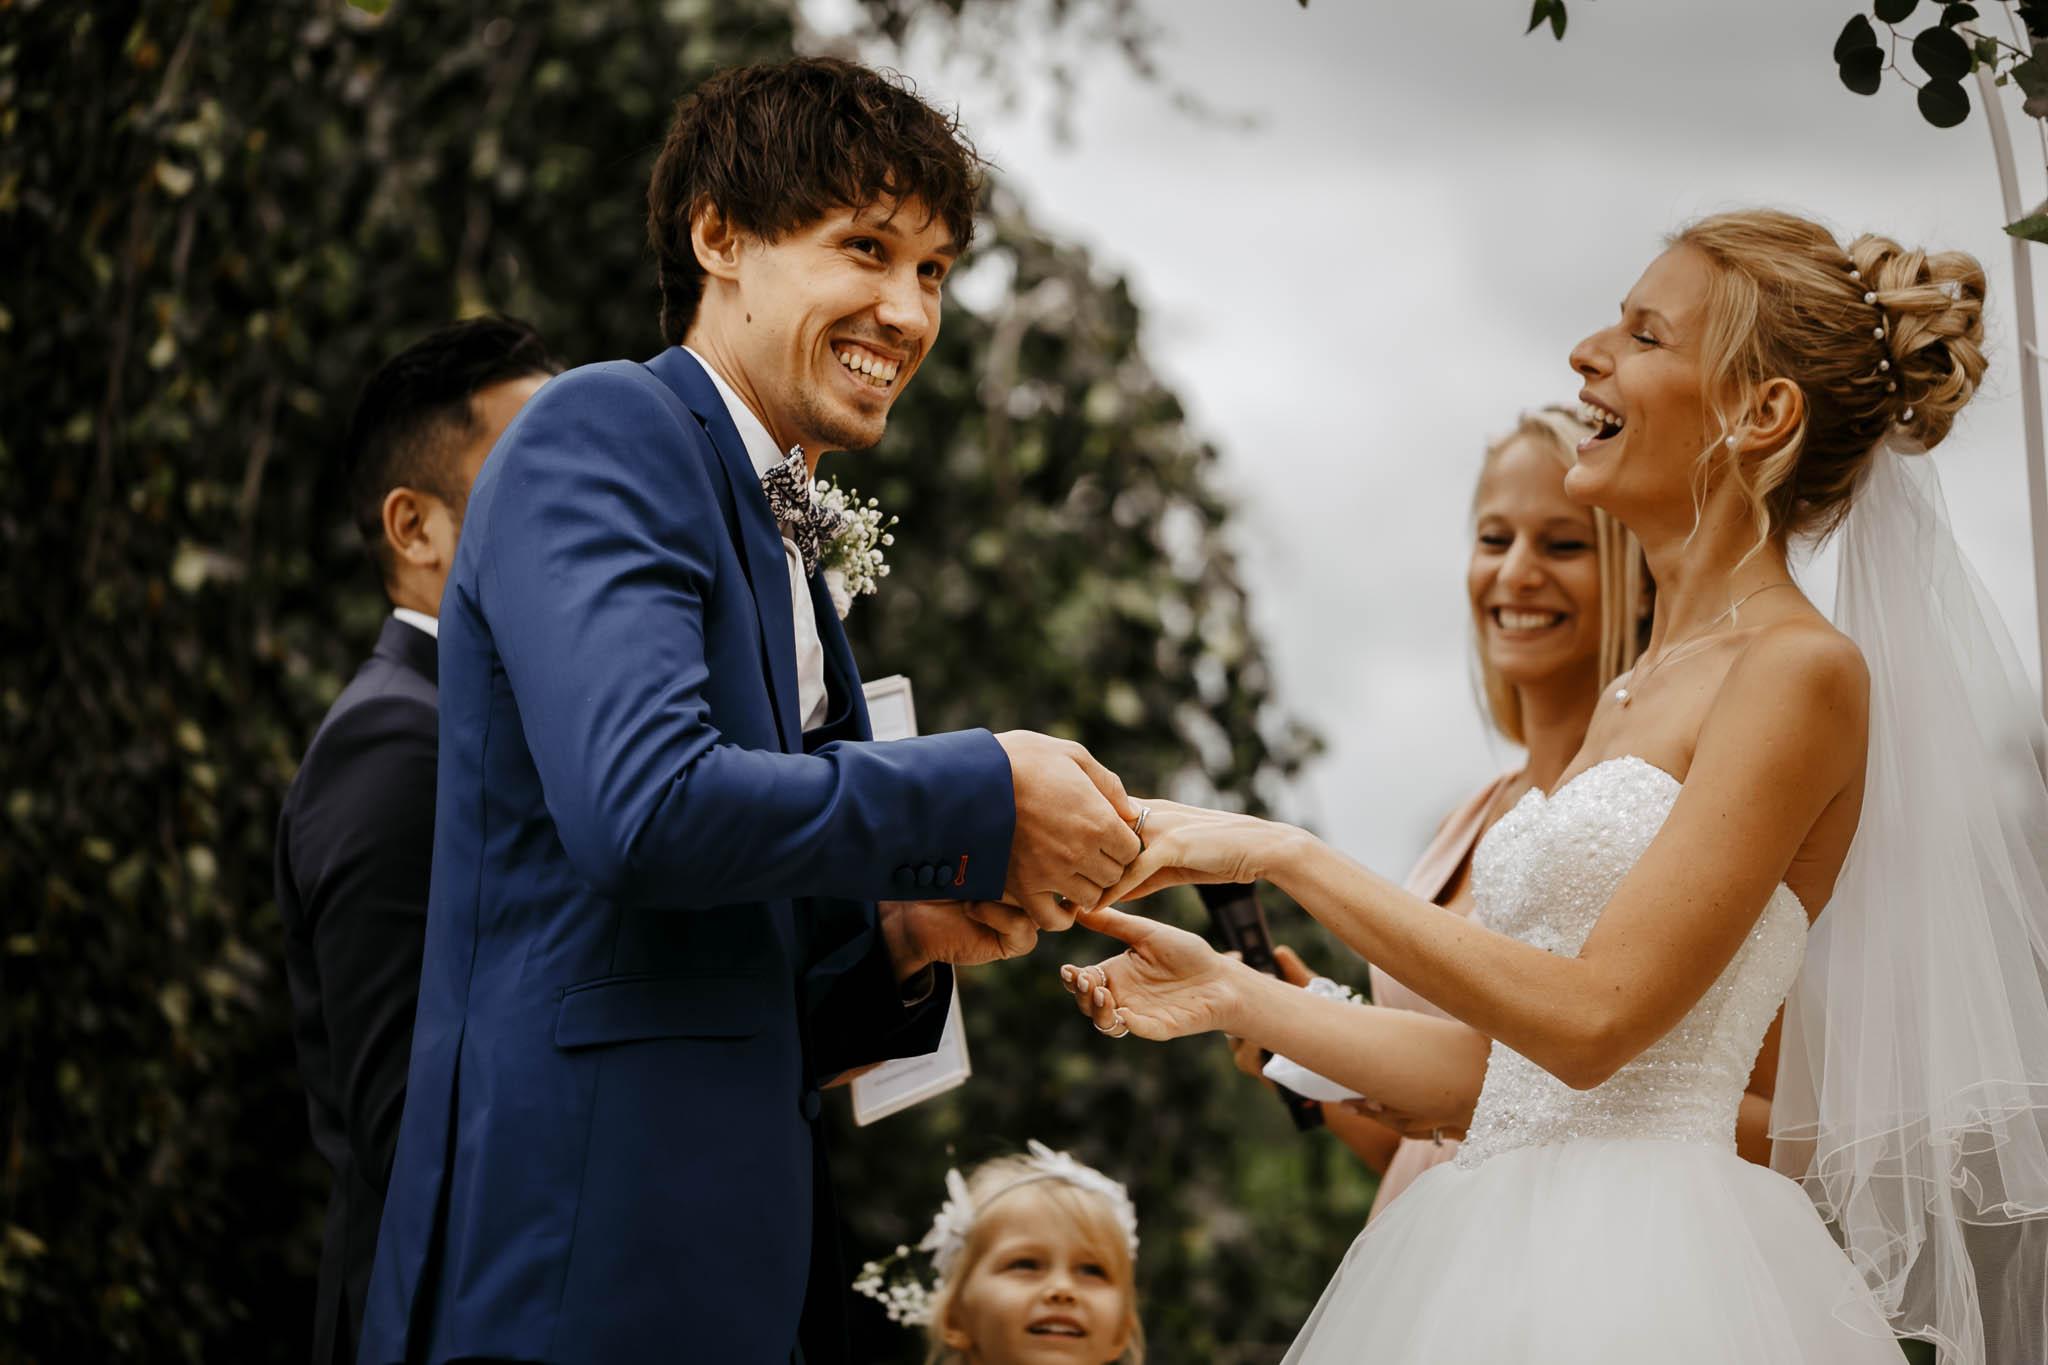 mariage-chateau-gaudras-ingold-50.jpg